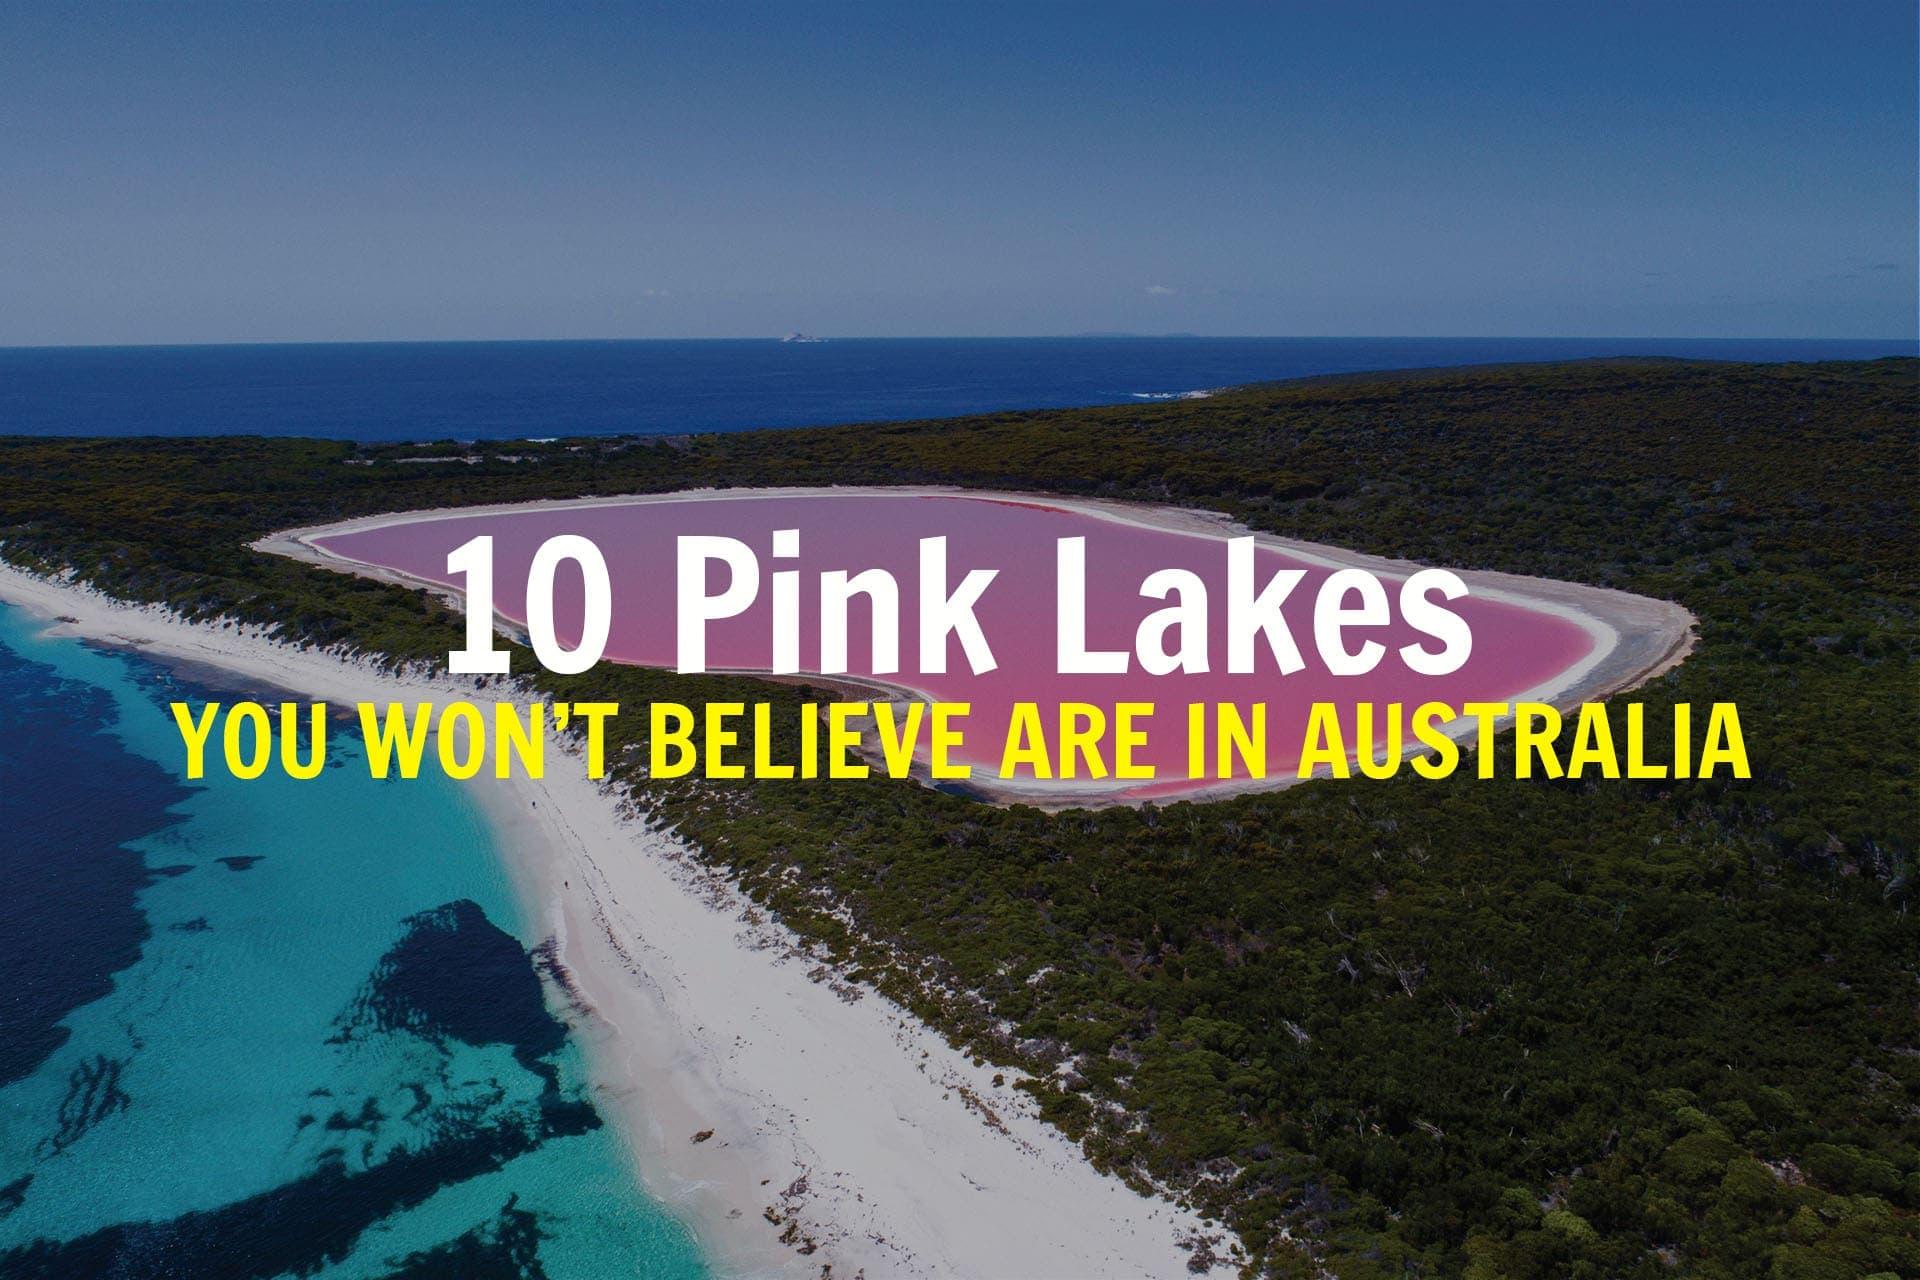 PINK-LAKES-IN-AUSTRALIA